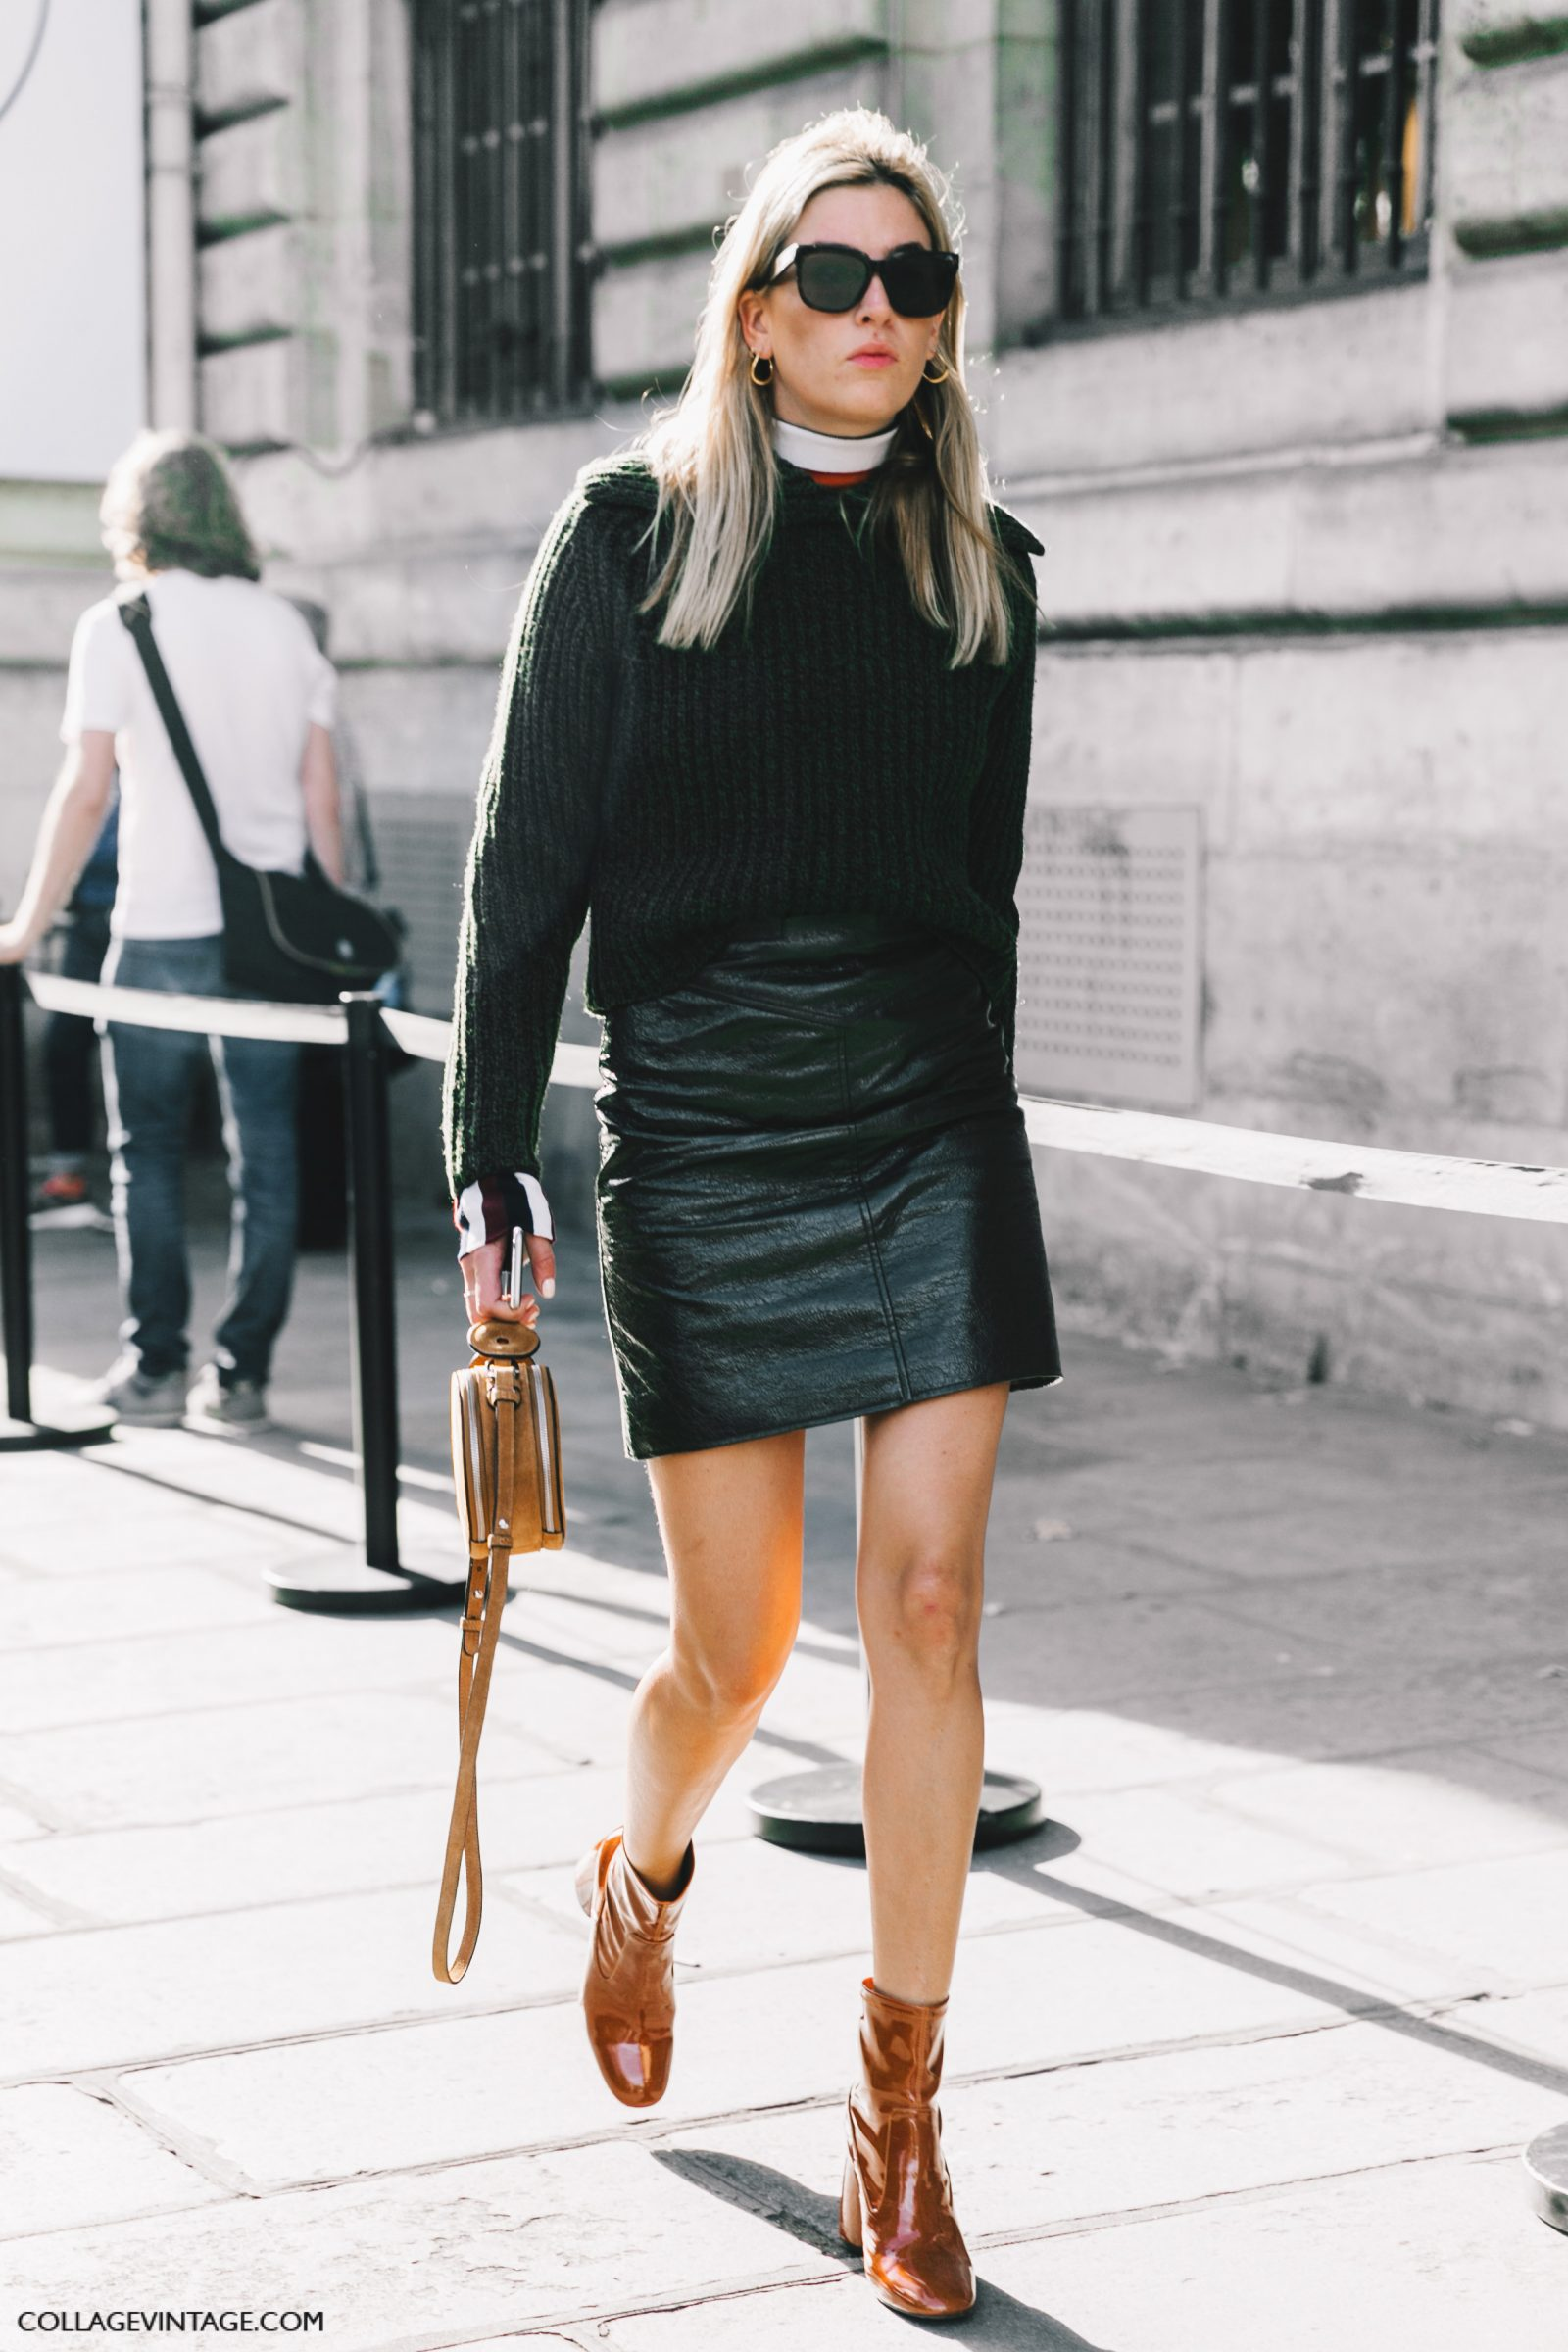 pfw-paris_fashion_week_ss17-street_style-outfits-collage_vintage-rochas-courreges-dries_van_noten-lanvin-guy_laroche-22